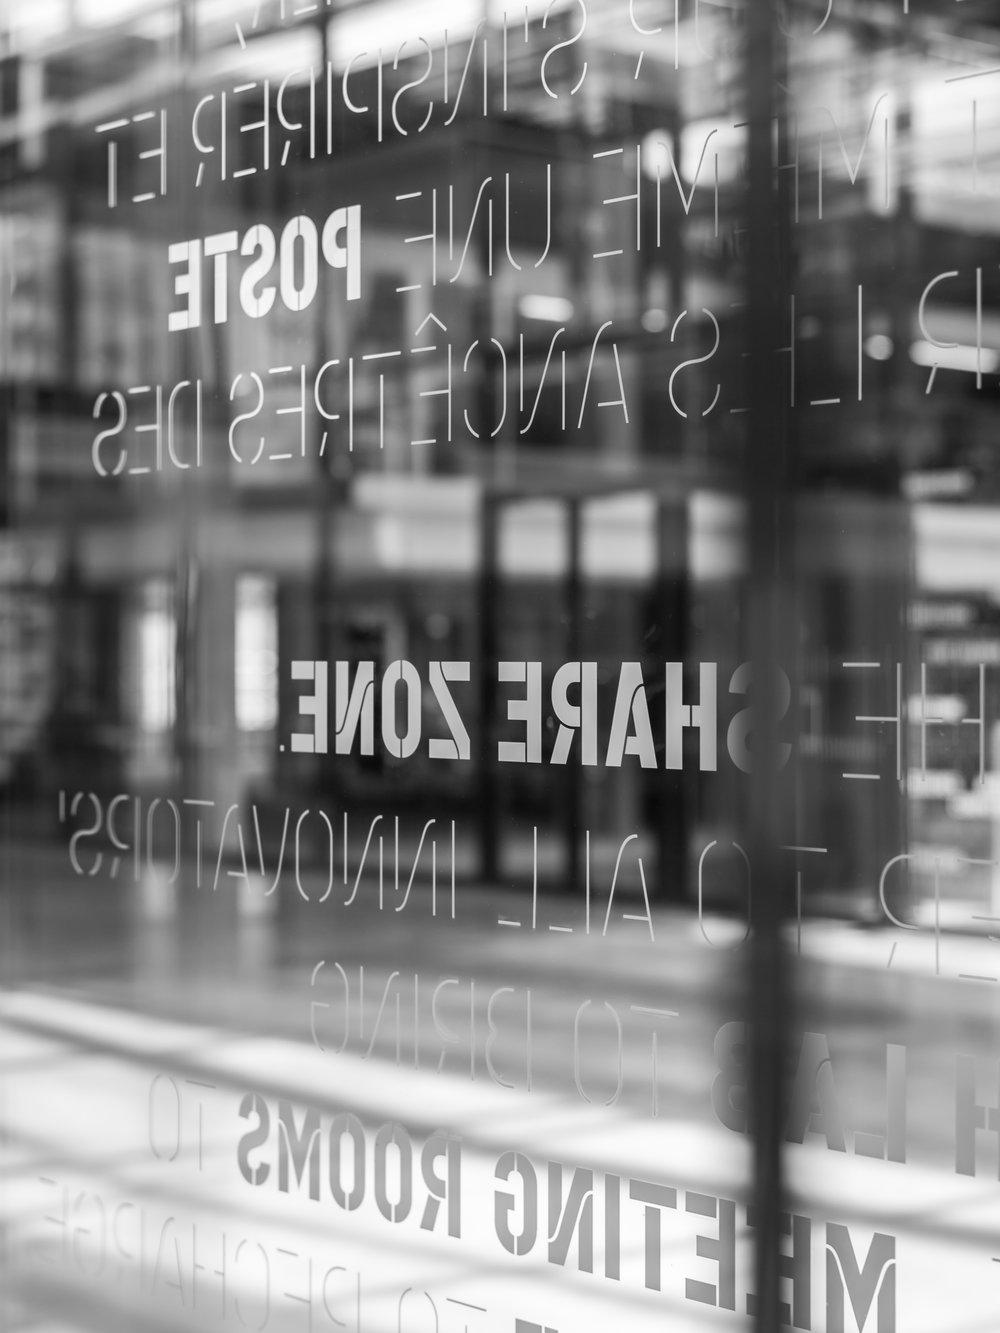 Station F-14.jpg